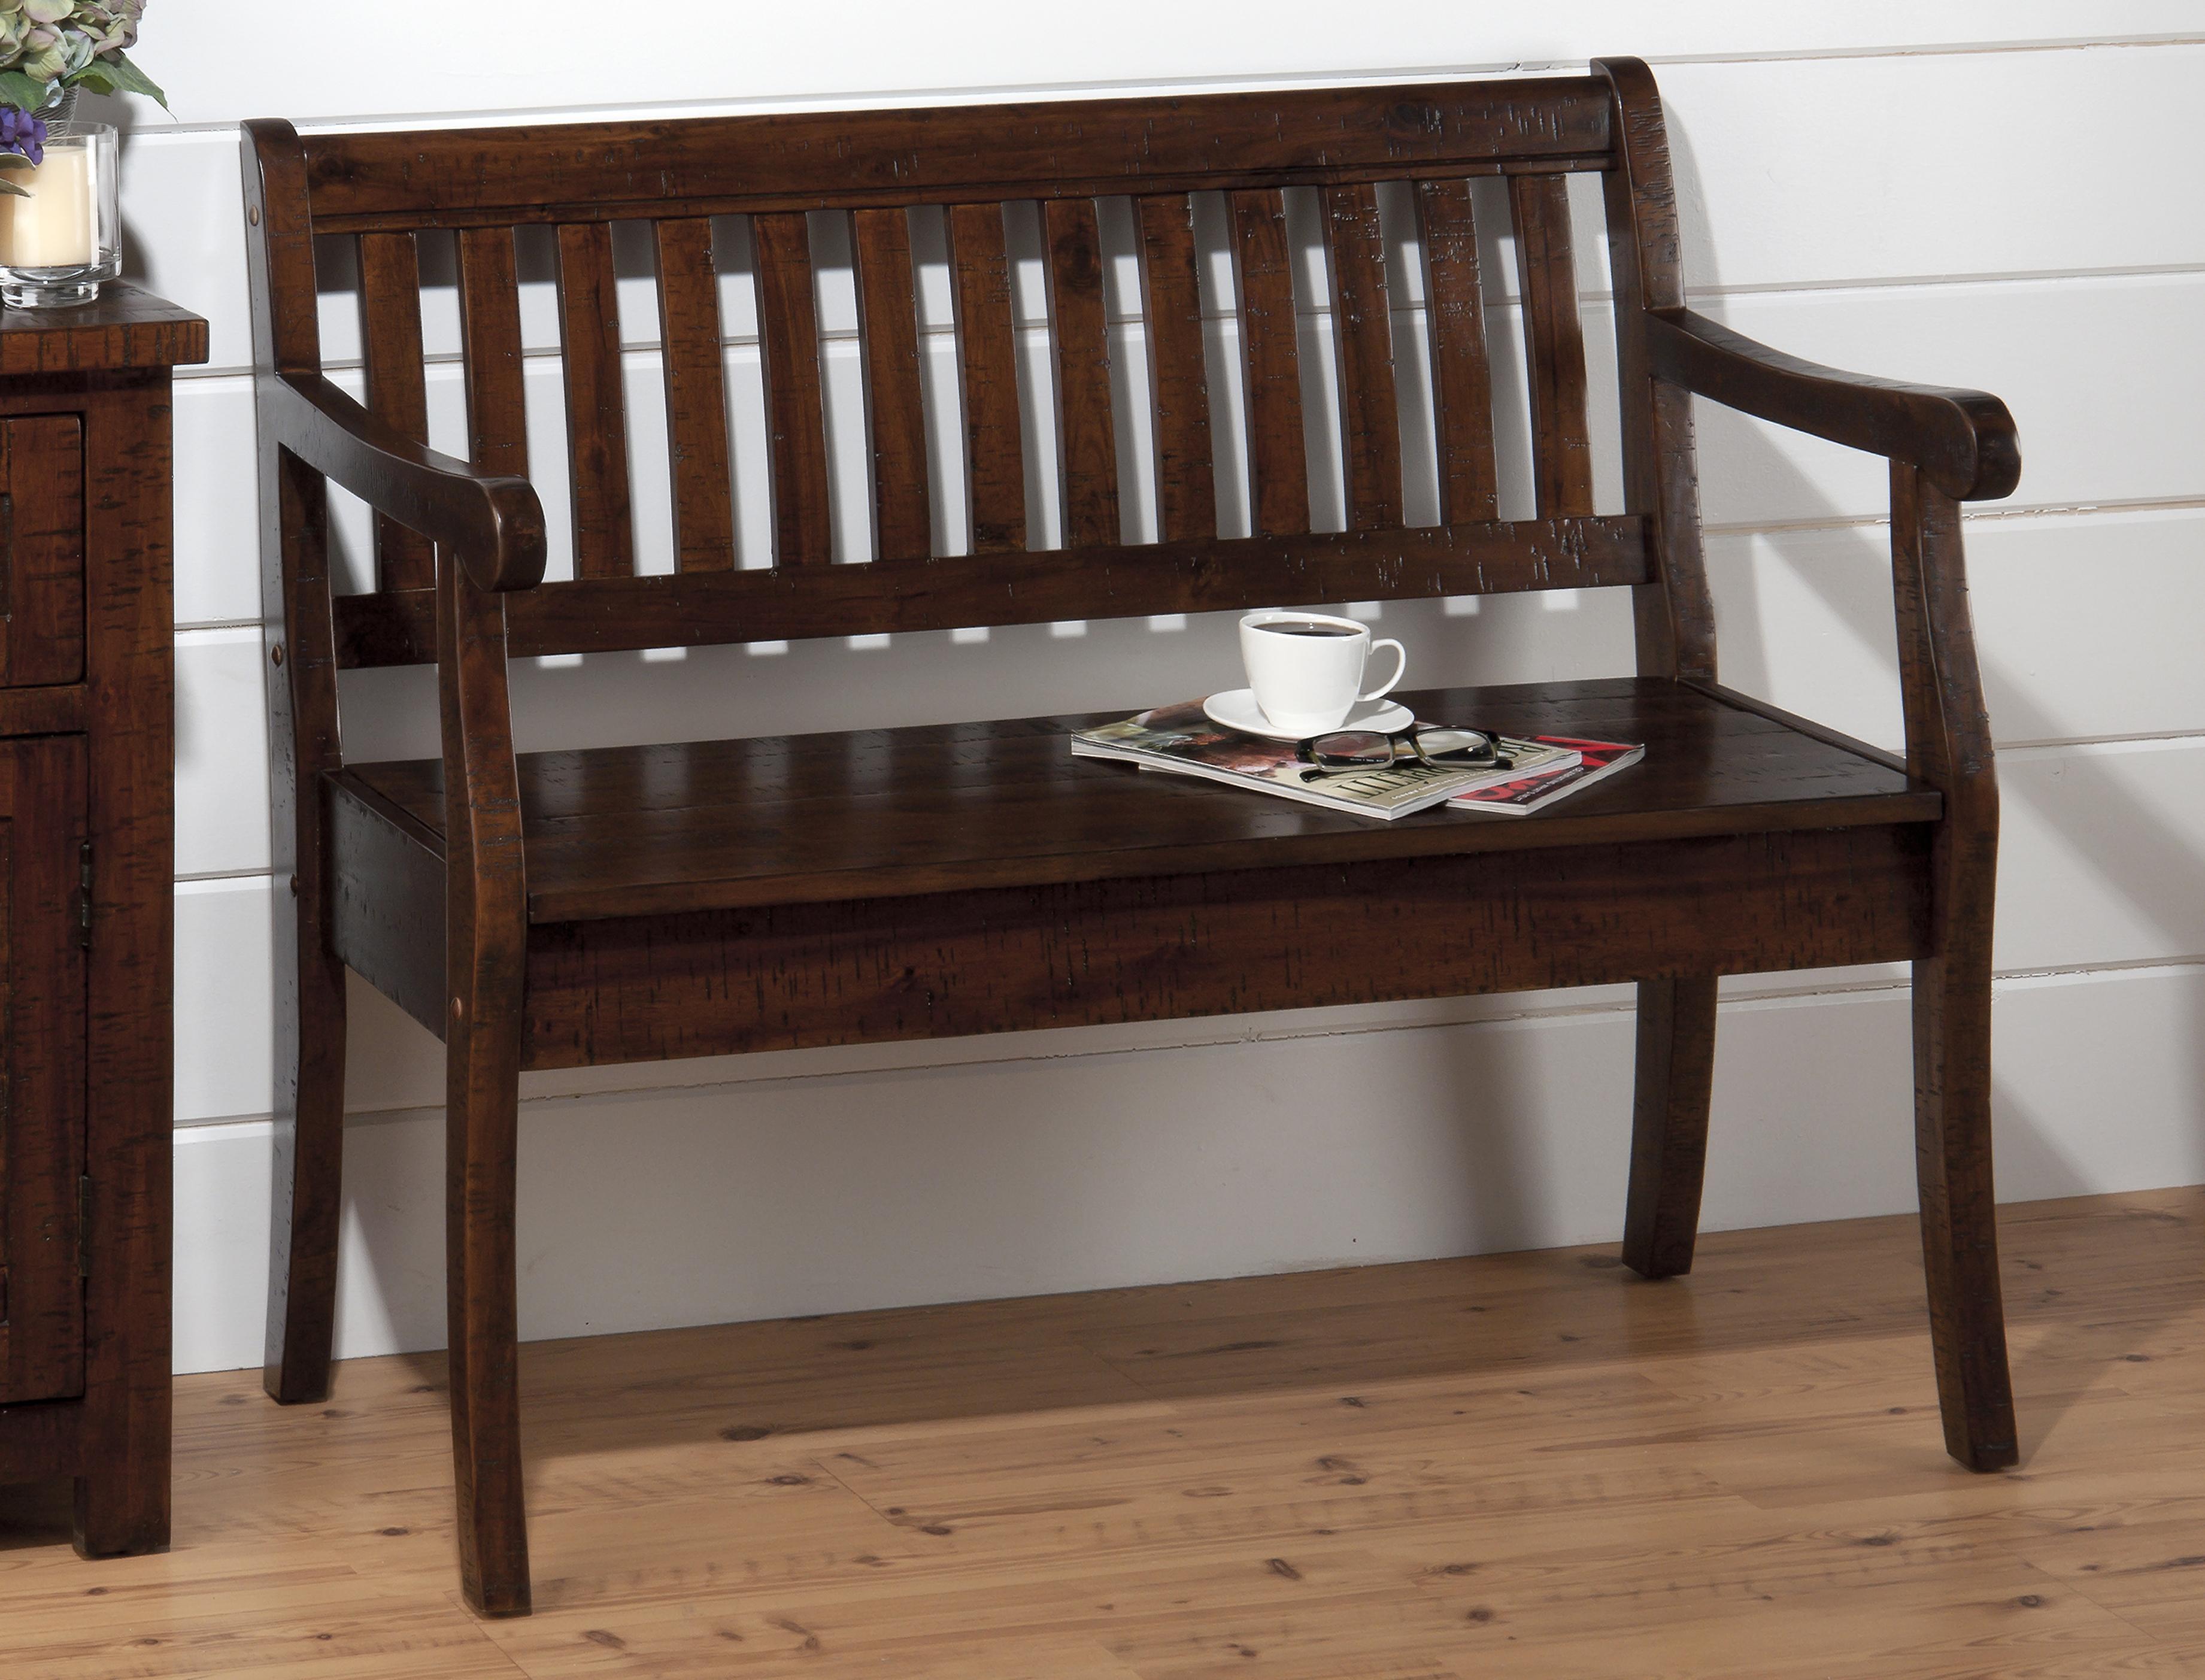 Jofran Urban Lodge Brown Storage Bench With Slat Back Dream Home Furniture Bench